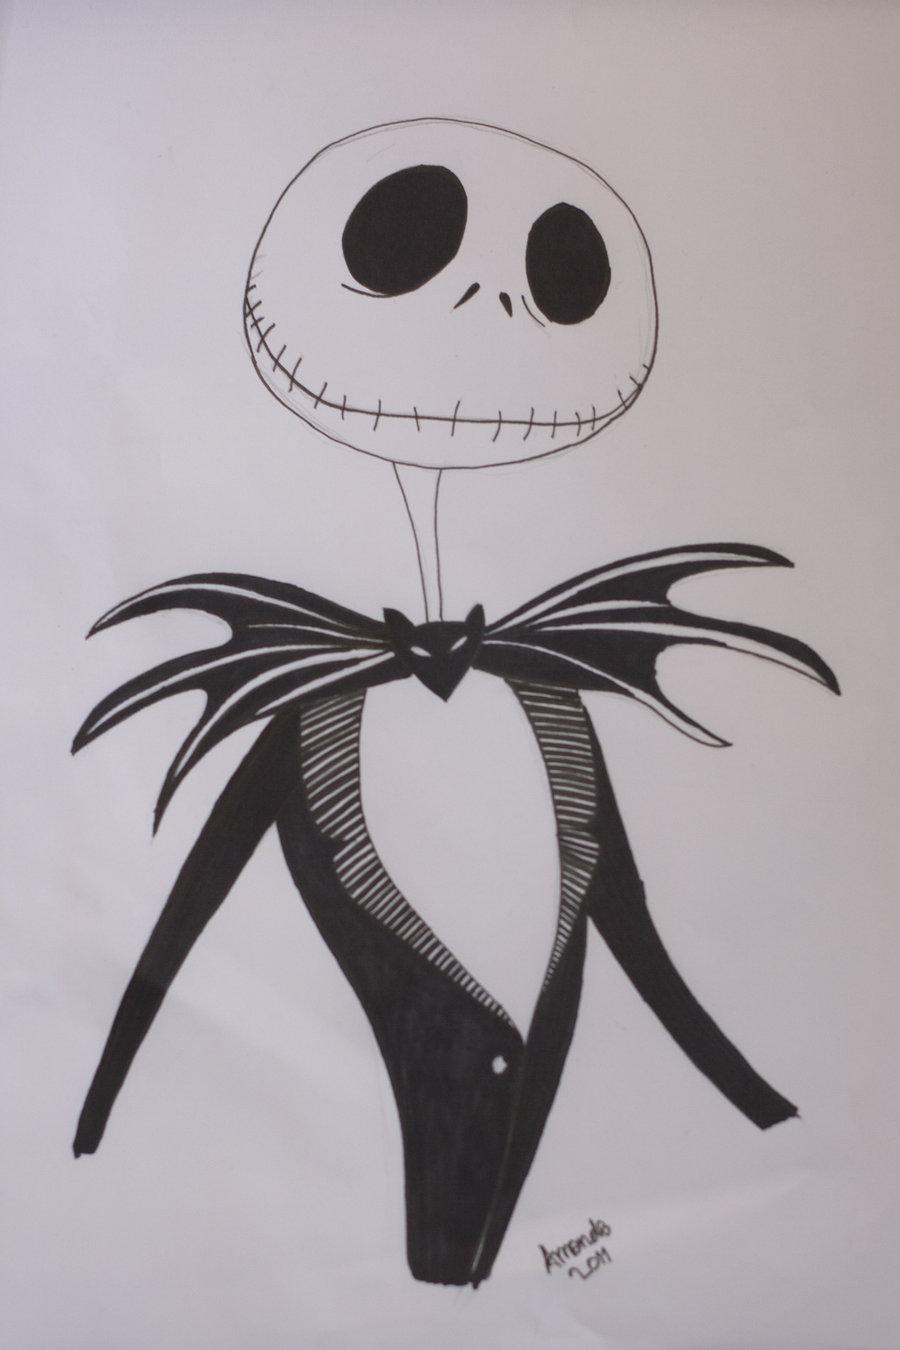 Drawn sleleton jack By Skellington DeviantArt Jack aamandapalmer